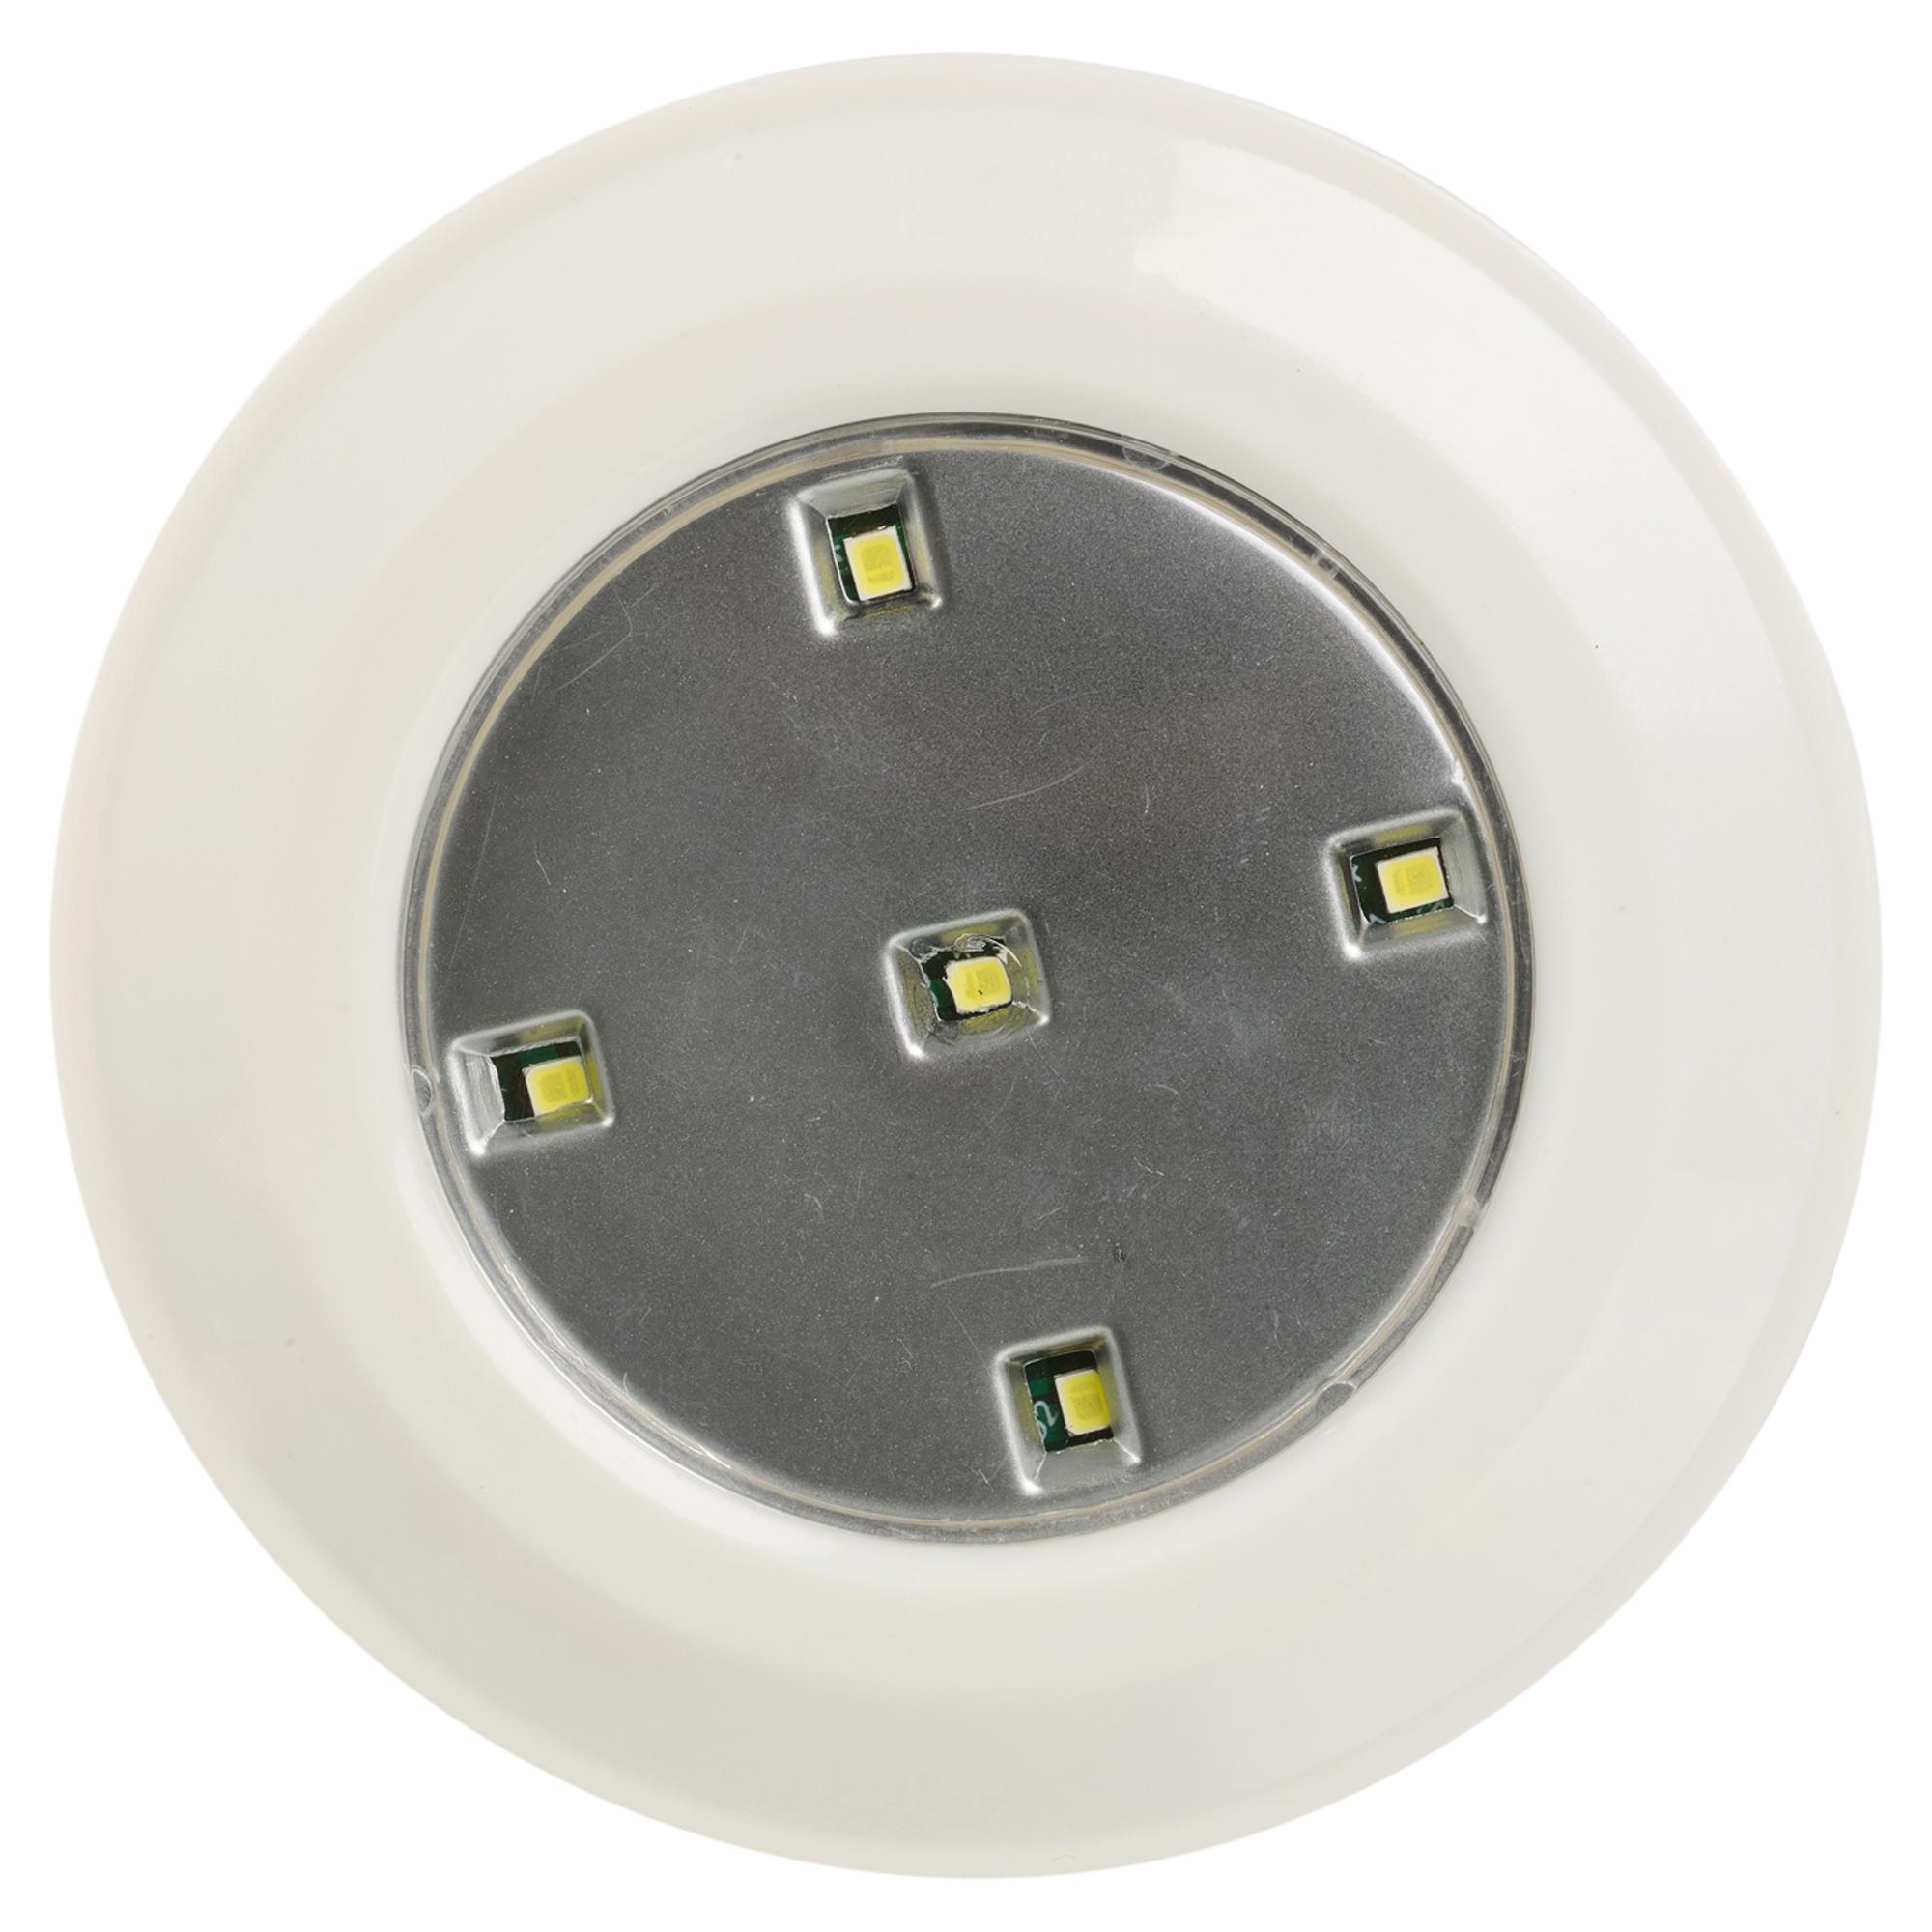 12 remote control wireless led push lights battery ceiling under kitchen cabinet 8711252798622. Black Bedroom Furniture Sets. Home Design Ideas